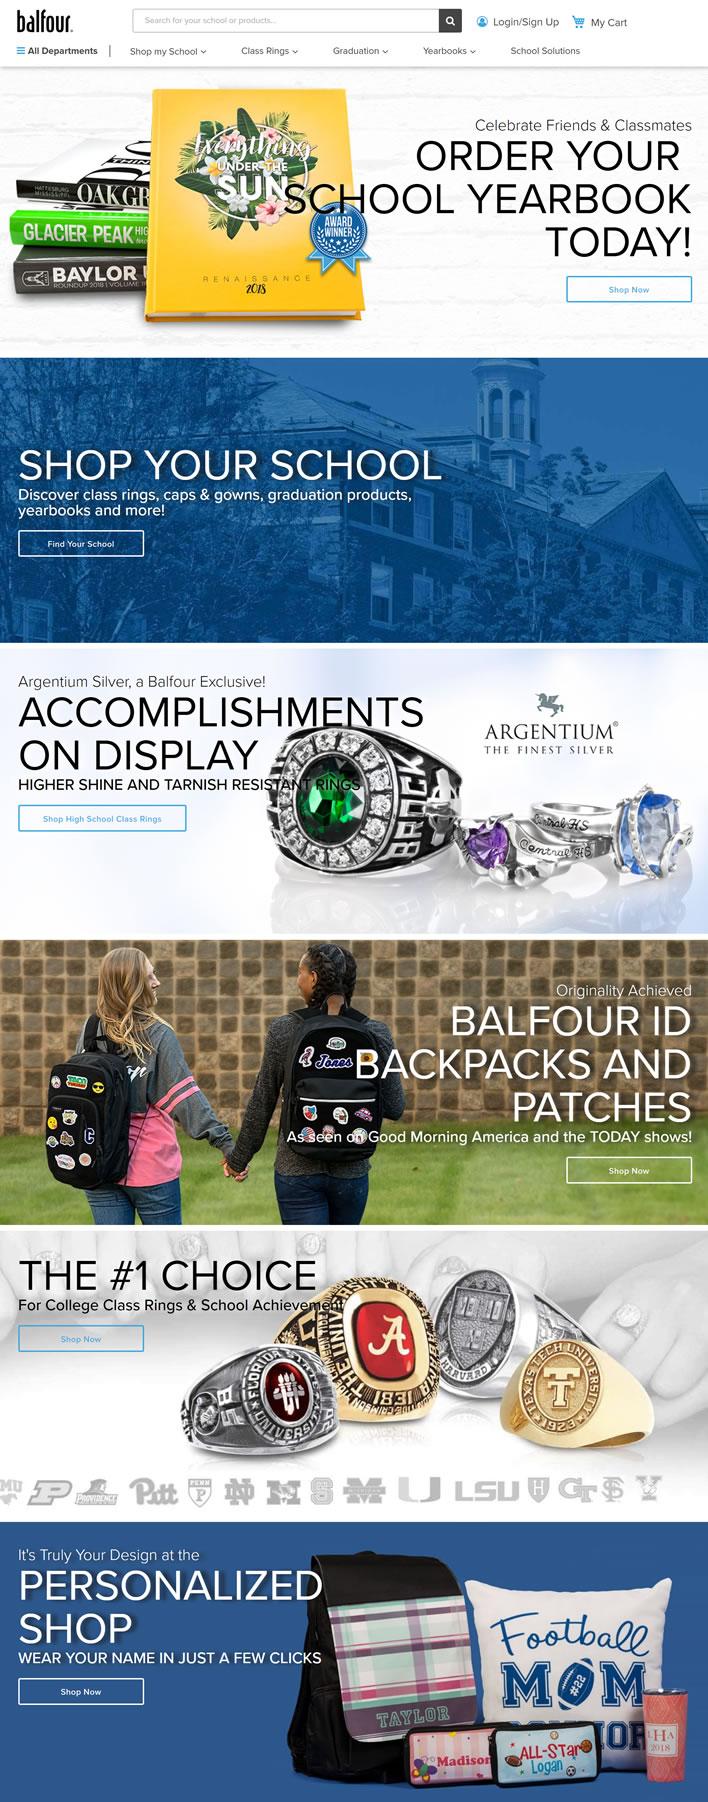 美国班级戒指、帽子和礼服、毕业产品、年鉴:Balfour